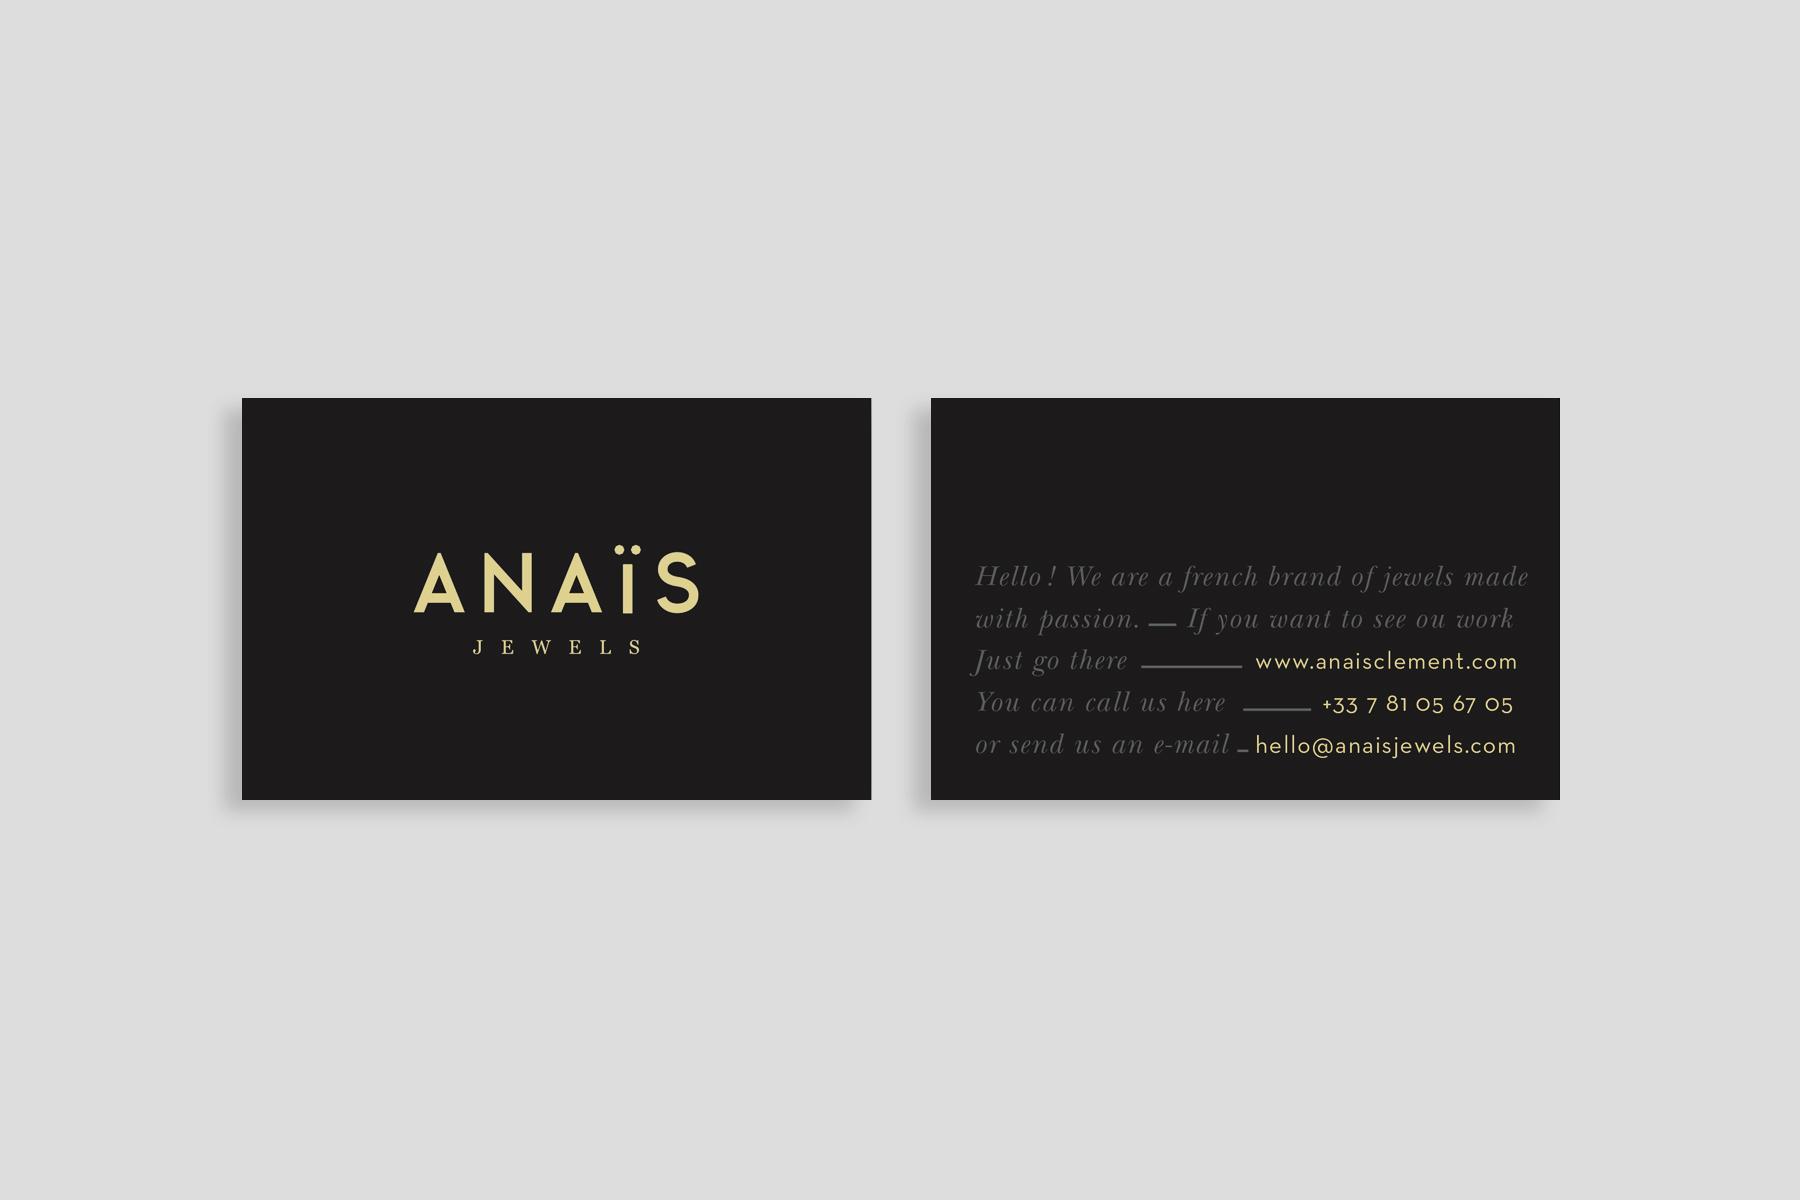 anais_jewels02